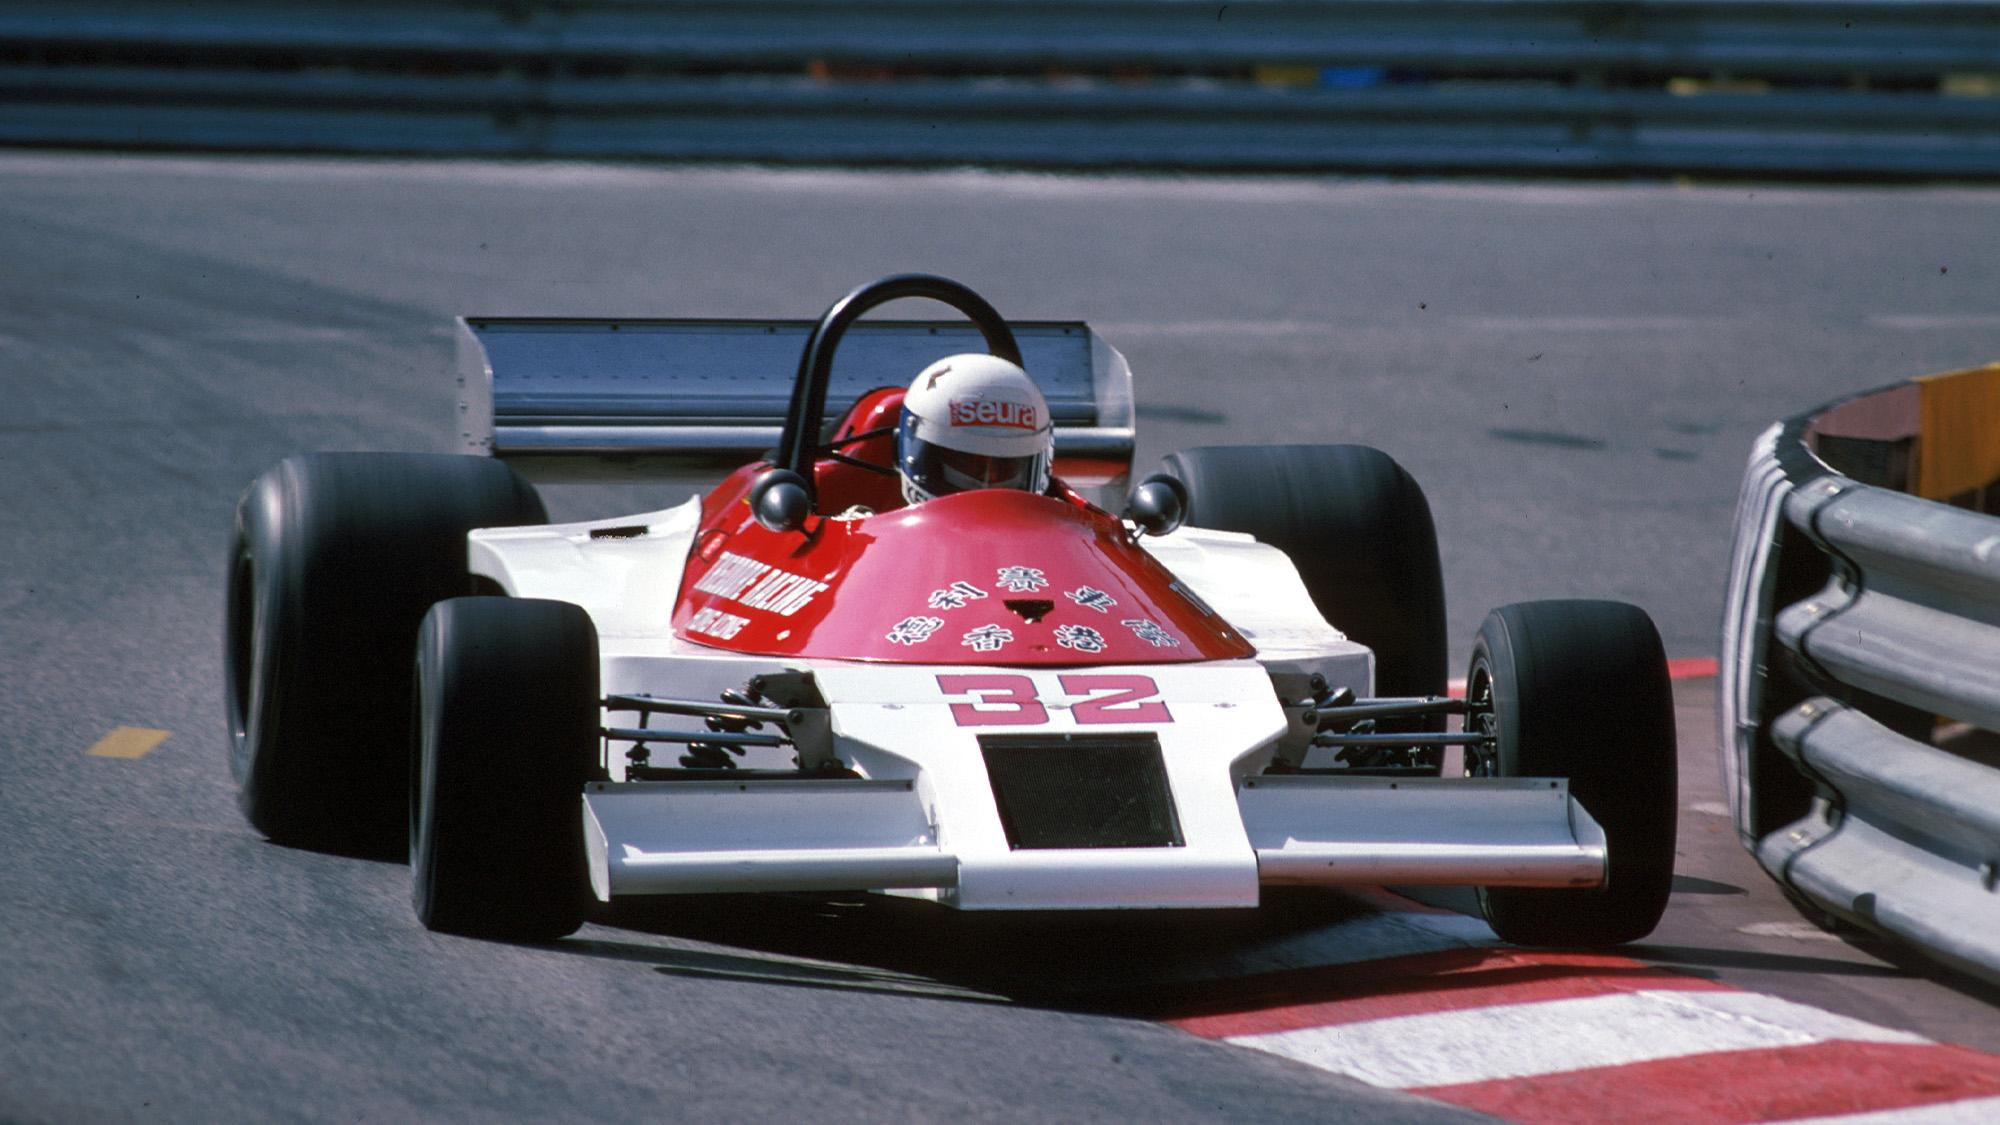 Keke Rosberg in the Theodore-Ford TR1 during the 1978 F1 Monaco Grand Prix